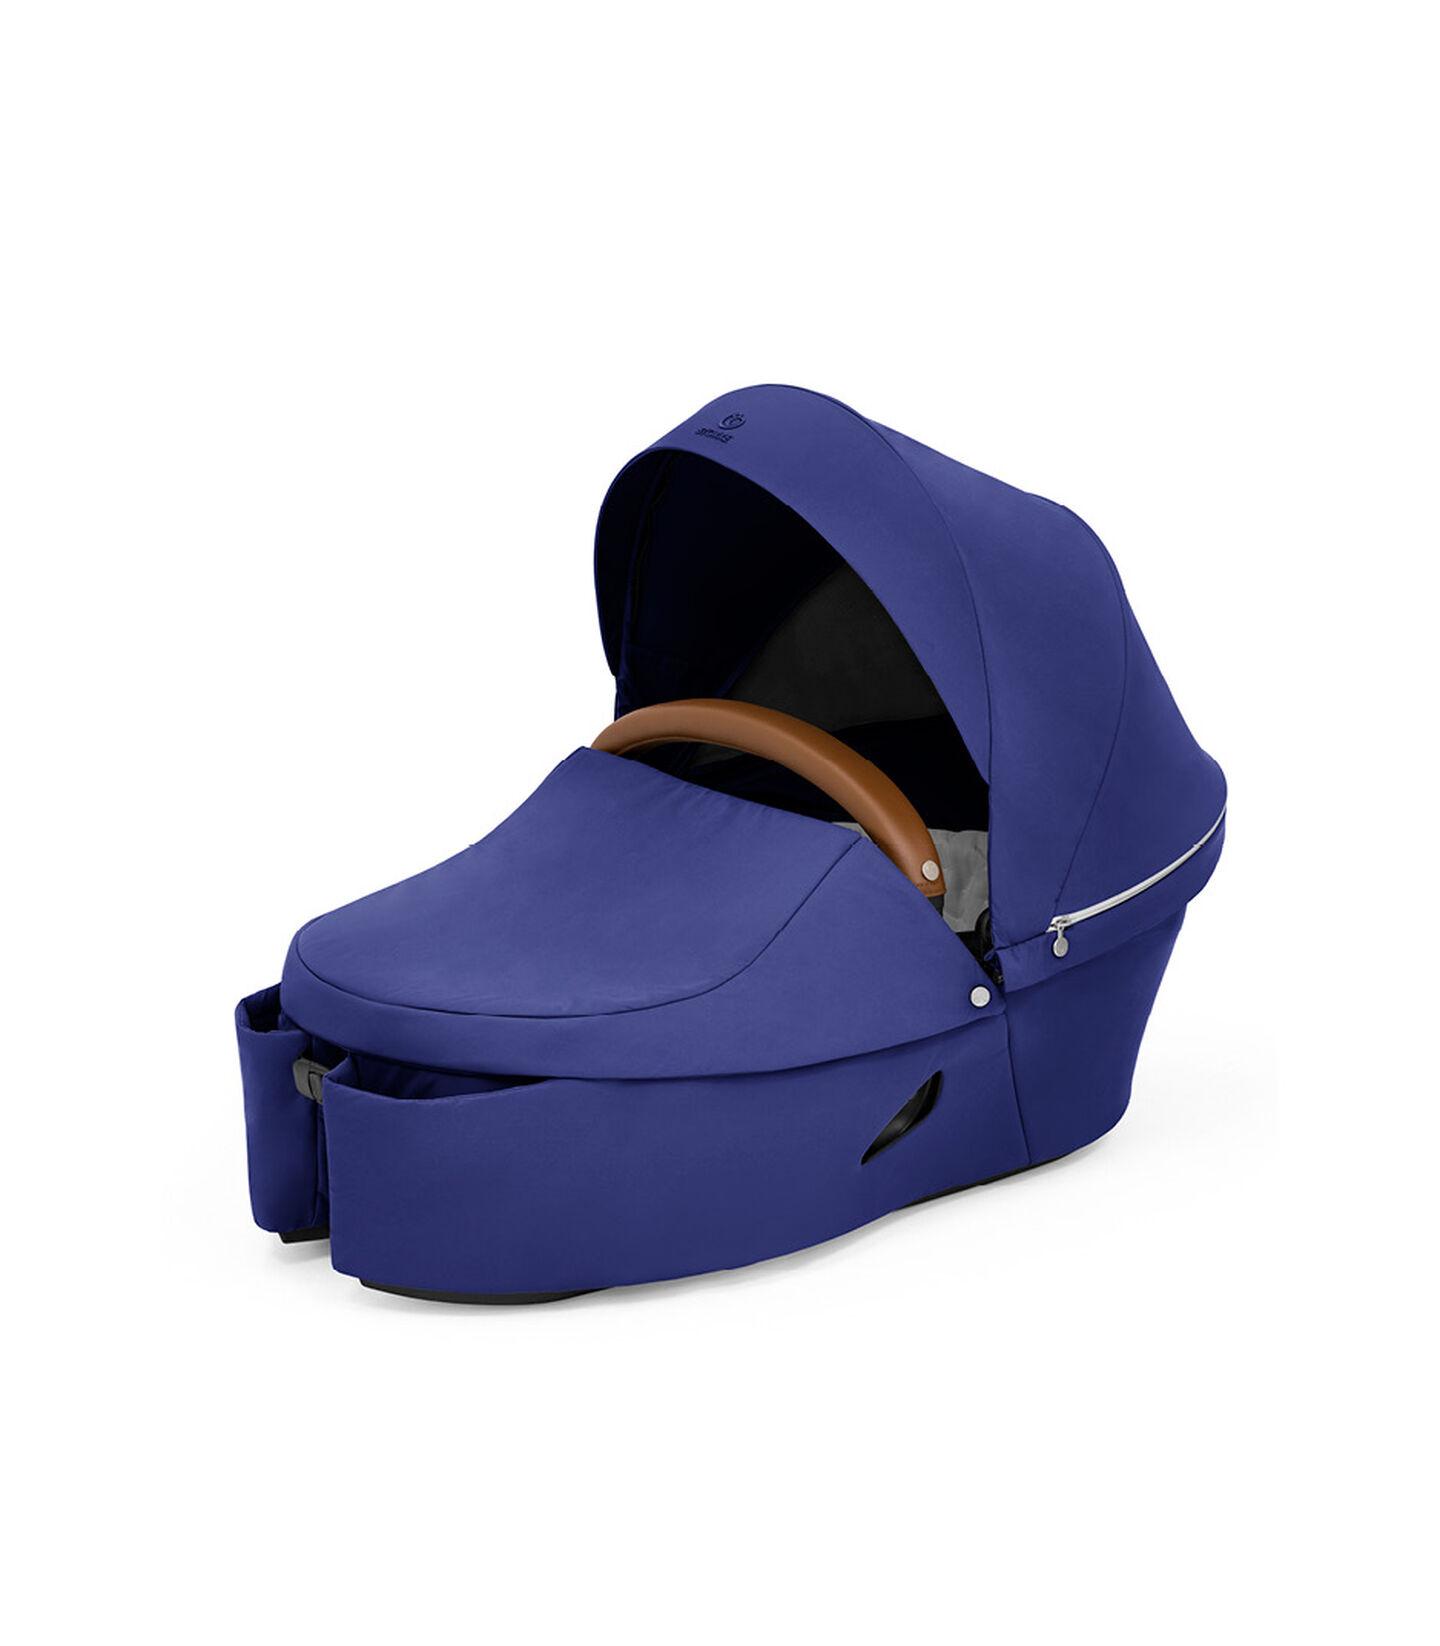 Stokke® Xplory® X Carry Cot Royal Blue, Королевский синий, mainview view 2